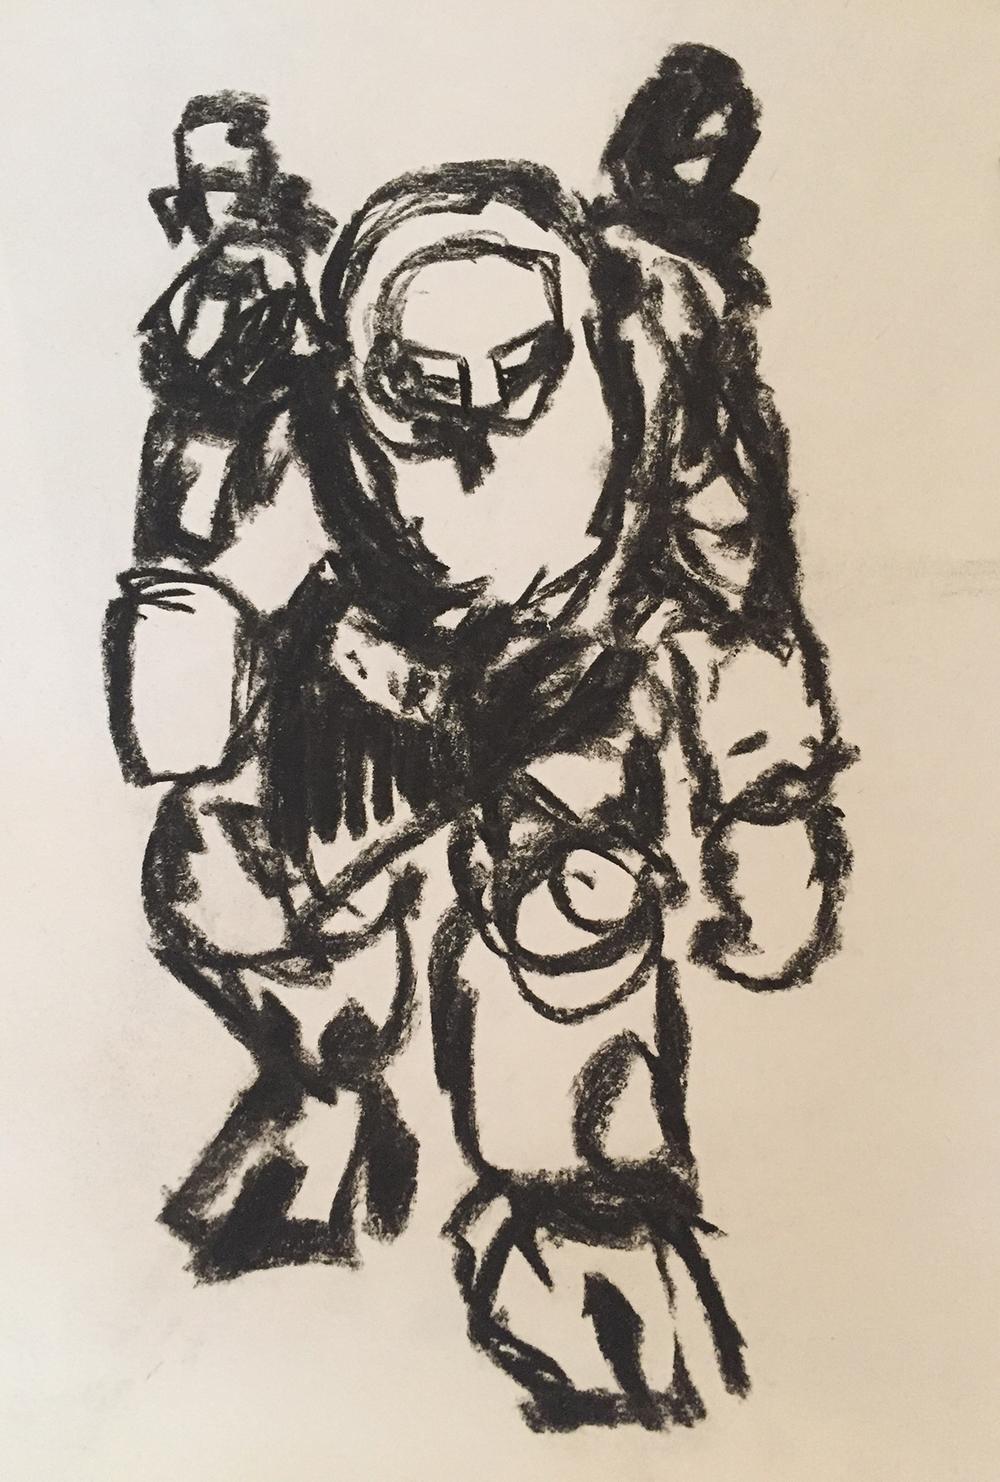 Golem, charcoal on paper